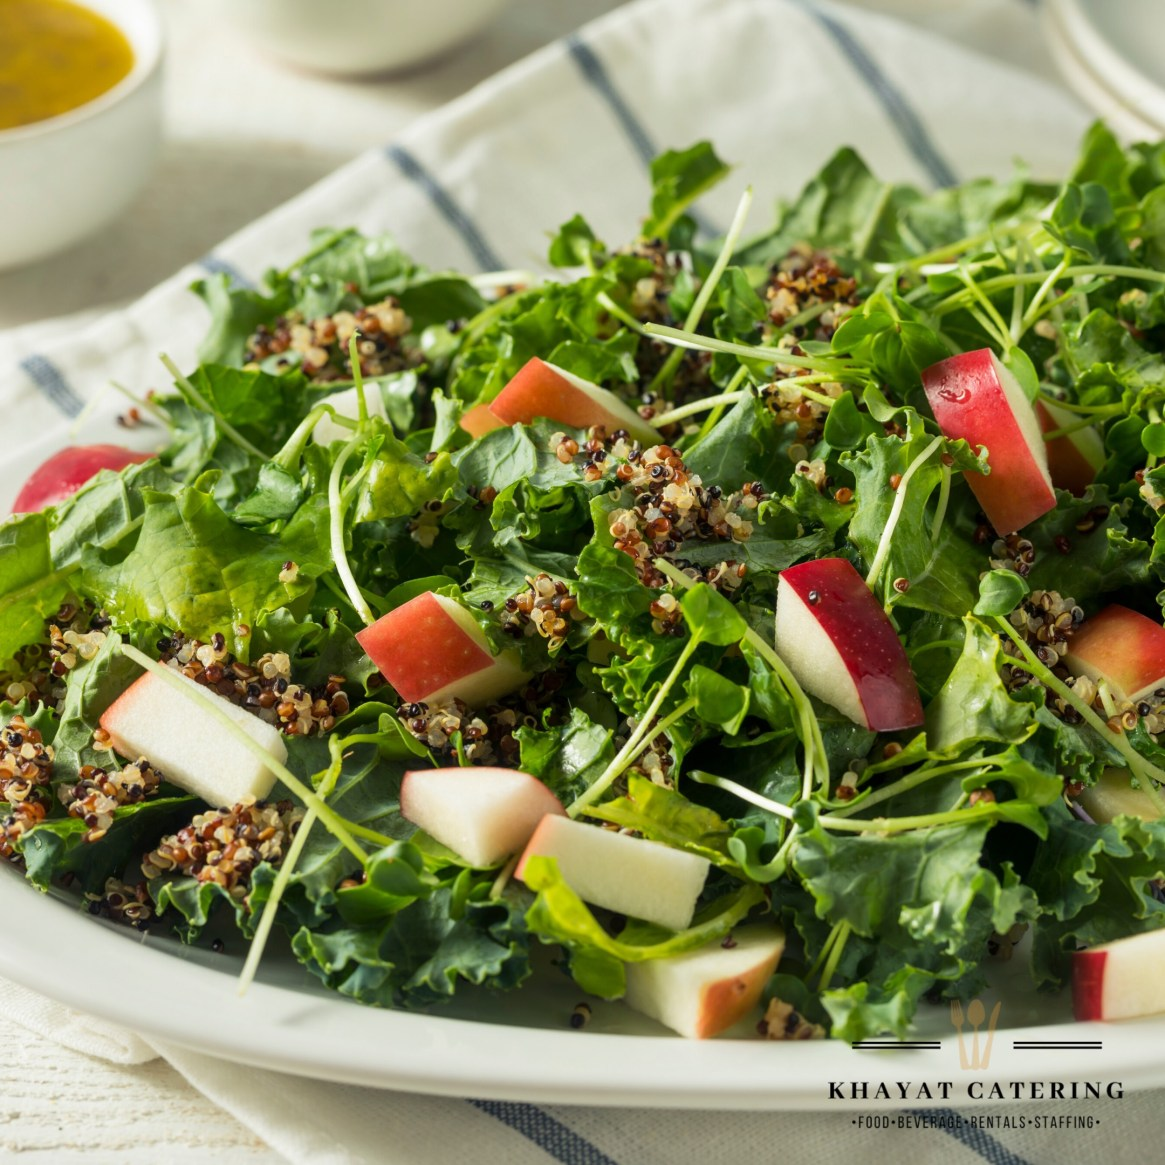 Khayat Catering apple pecan salad